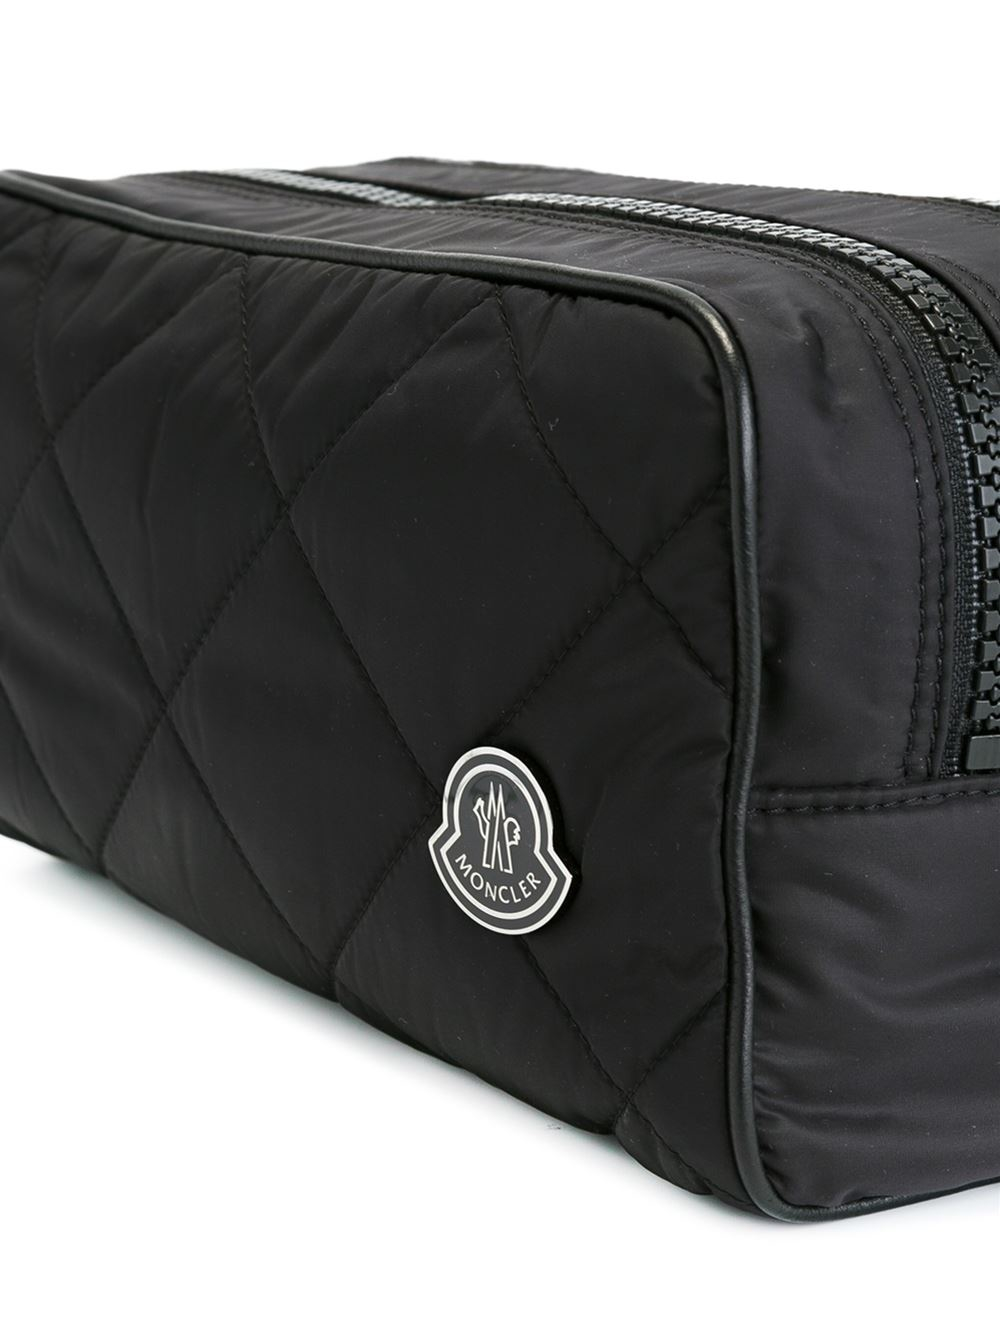 Lyst - Moncler Quilted Wash Bag in Black for Men b6ea9c7e385e5